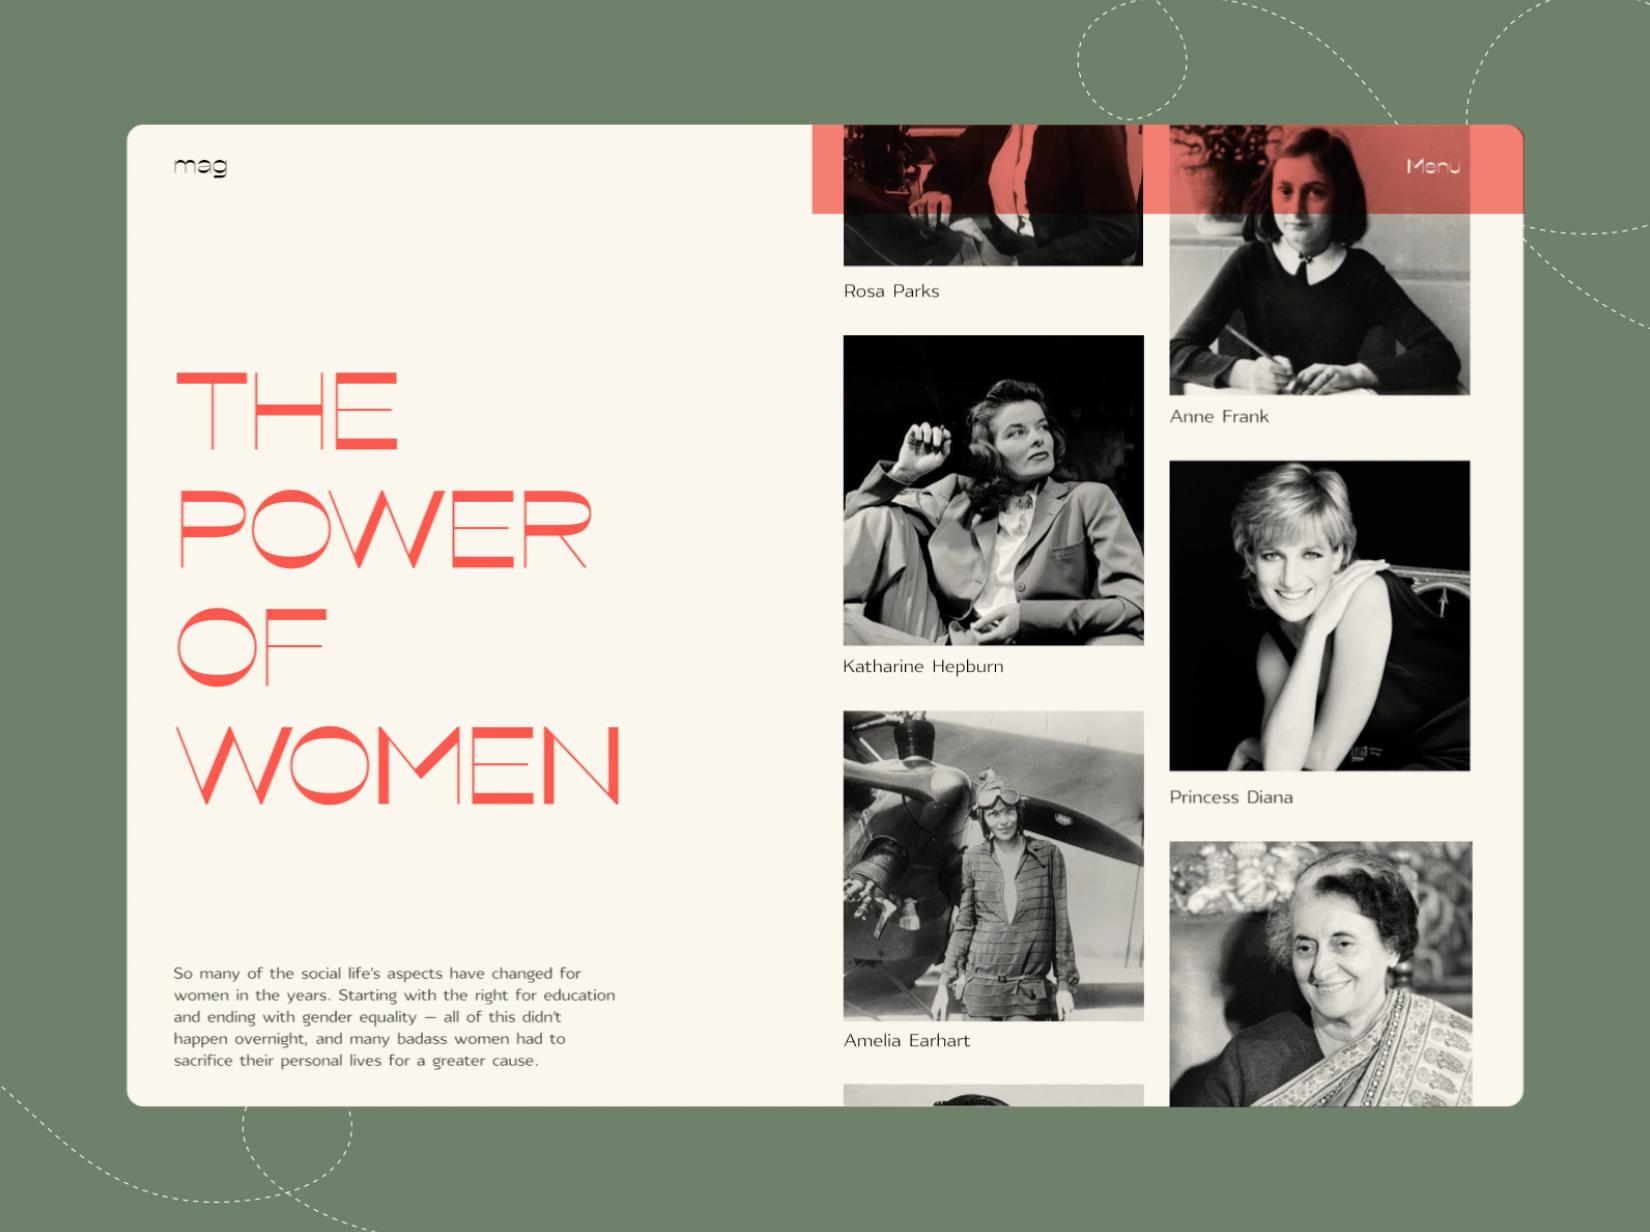 Powerful Women Website Gallery by tubik